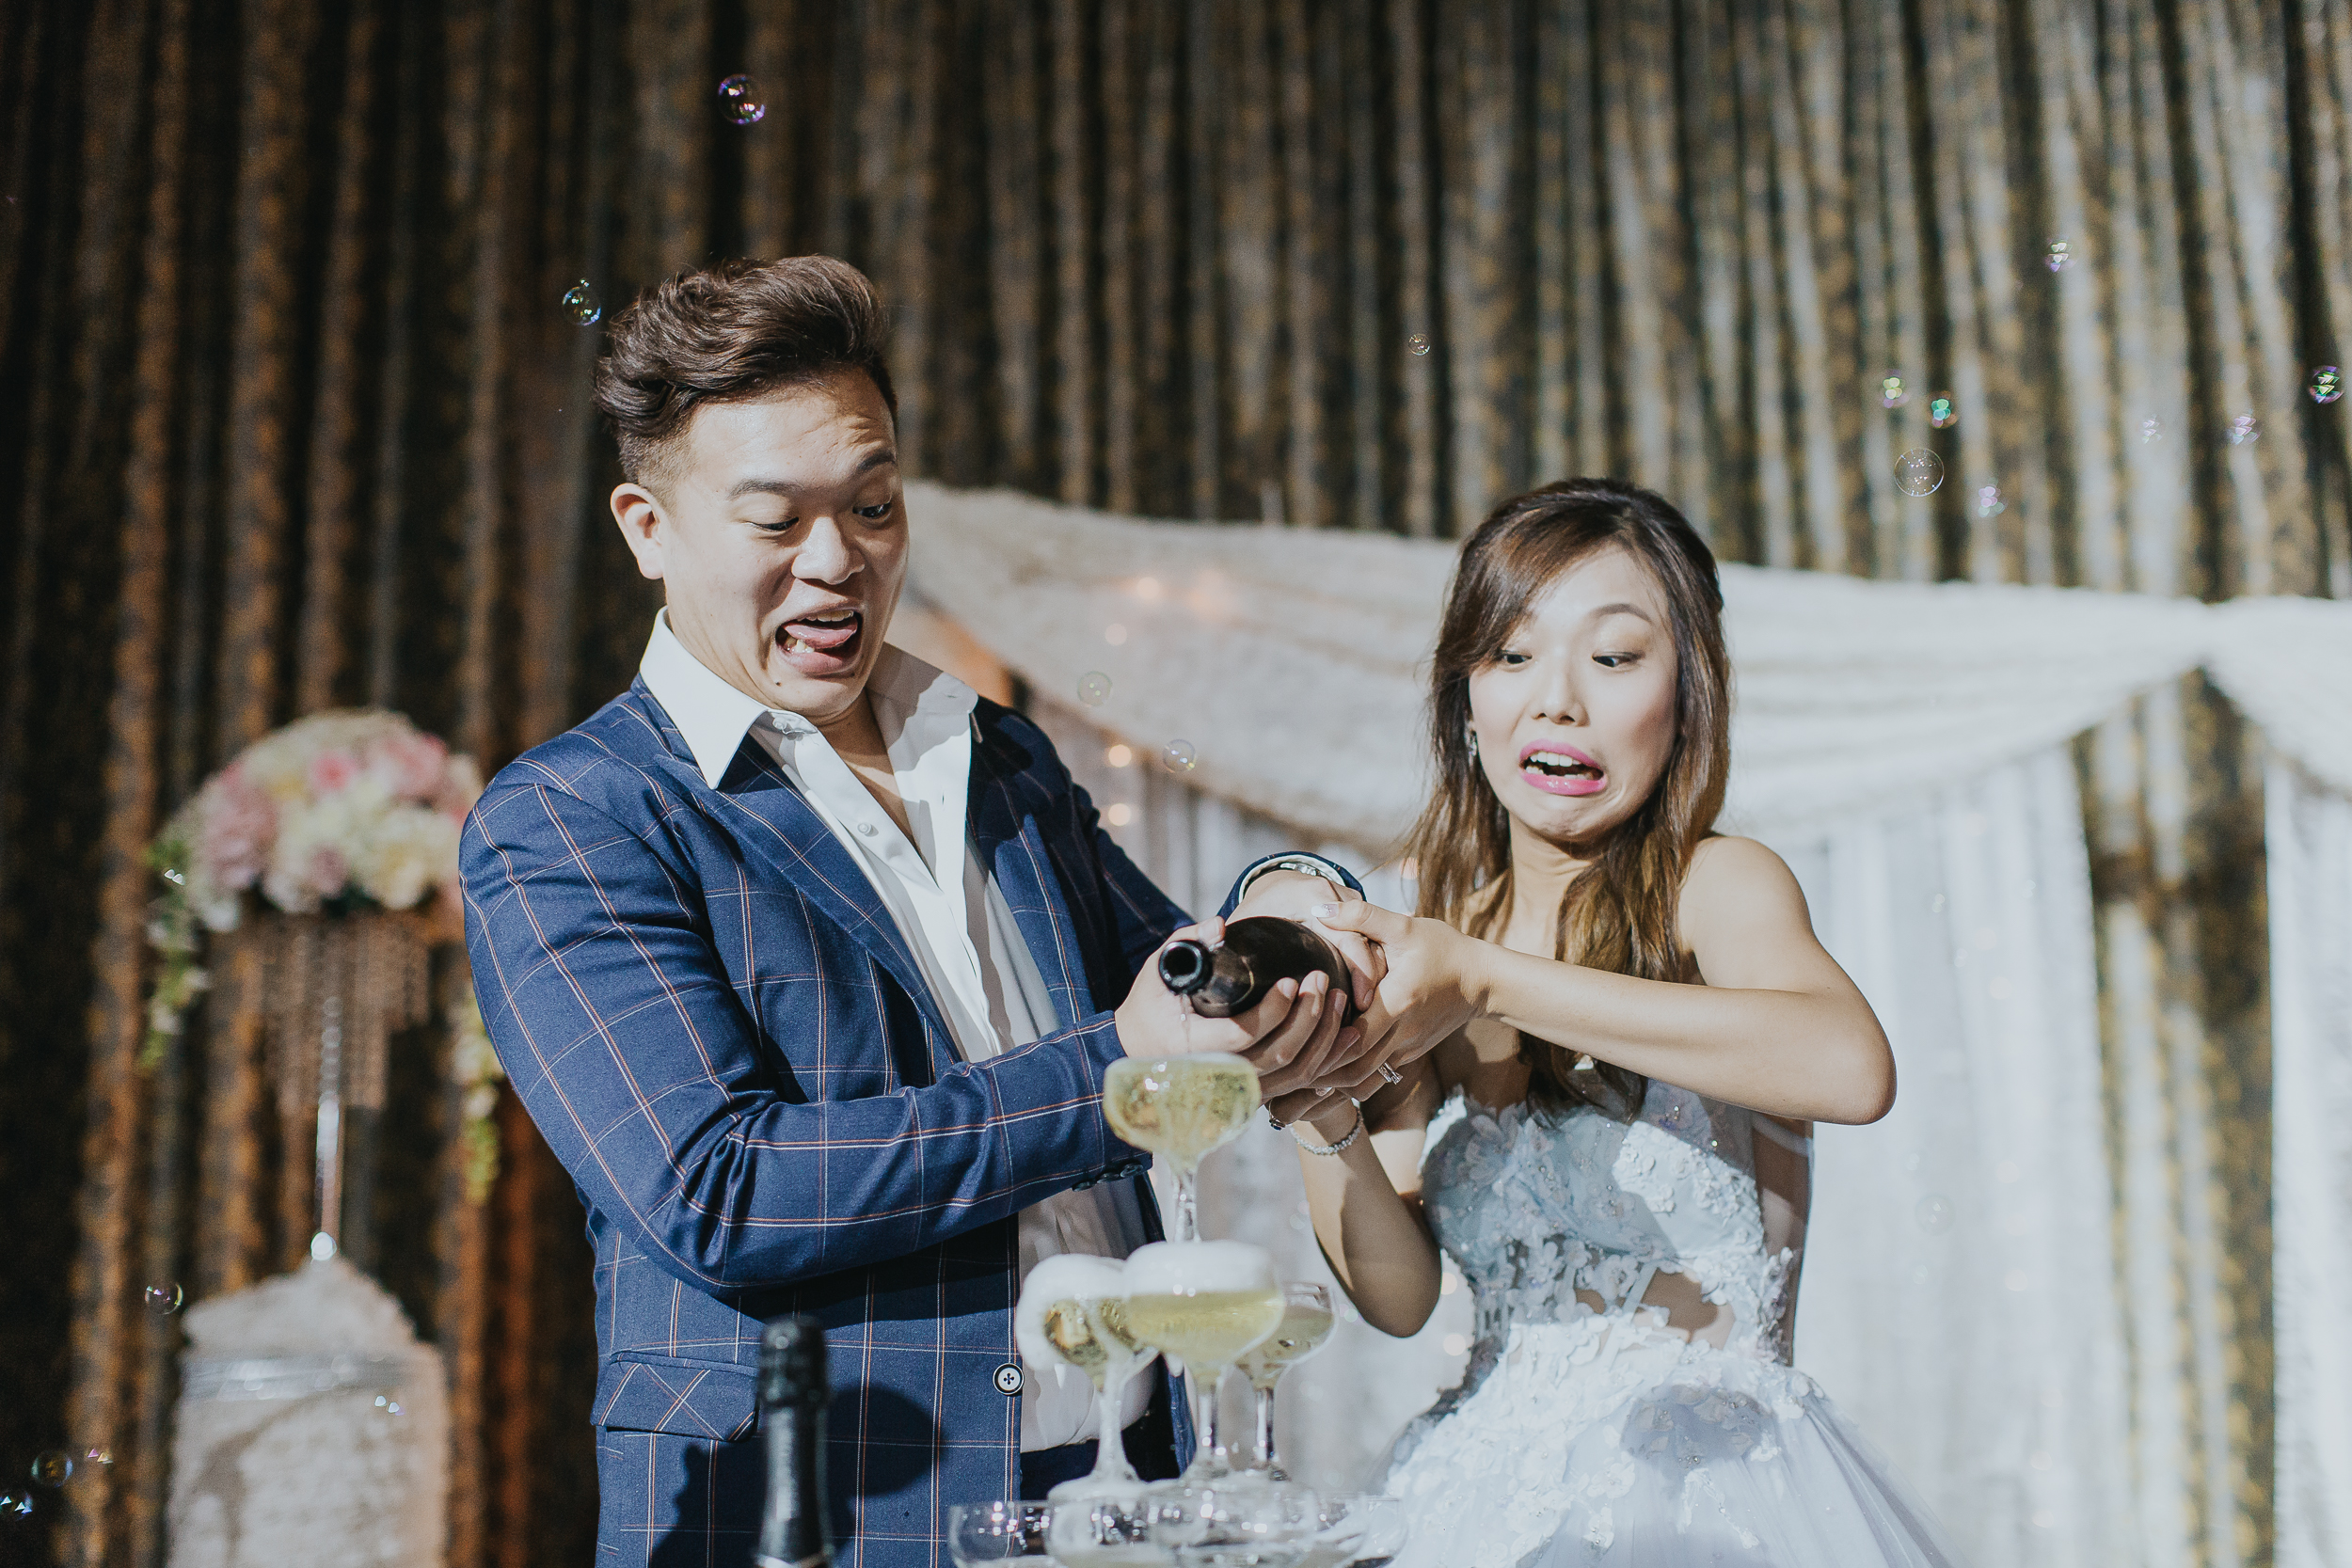 Singapore+Actual+Day+Wedding+Photographer+Grand+Mercure+Oliver+Estelle-0101.jpg